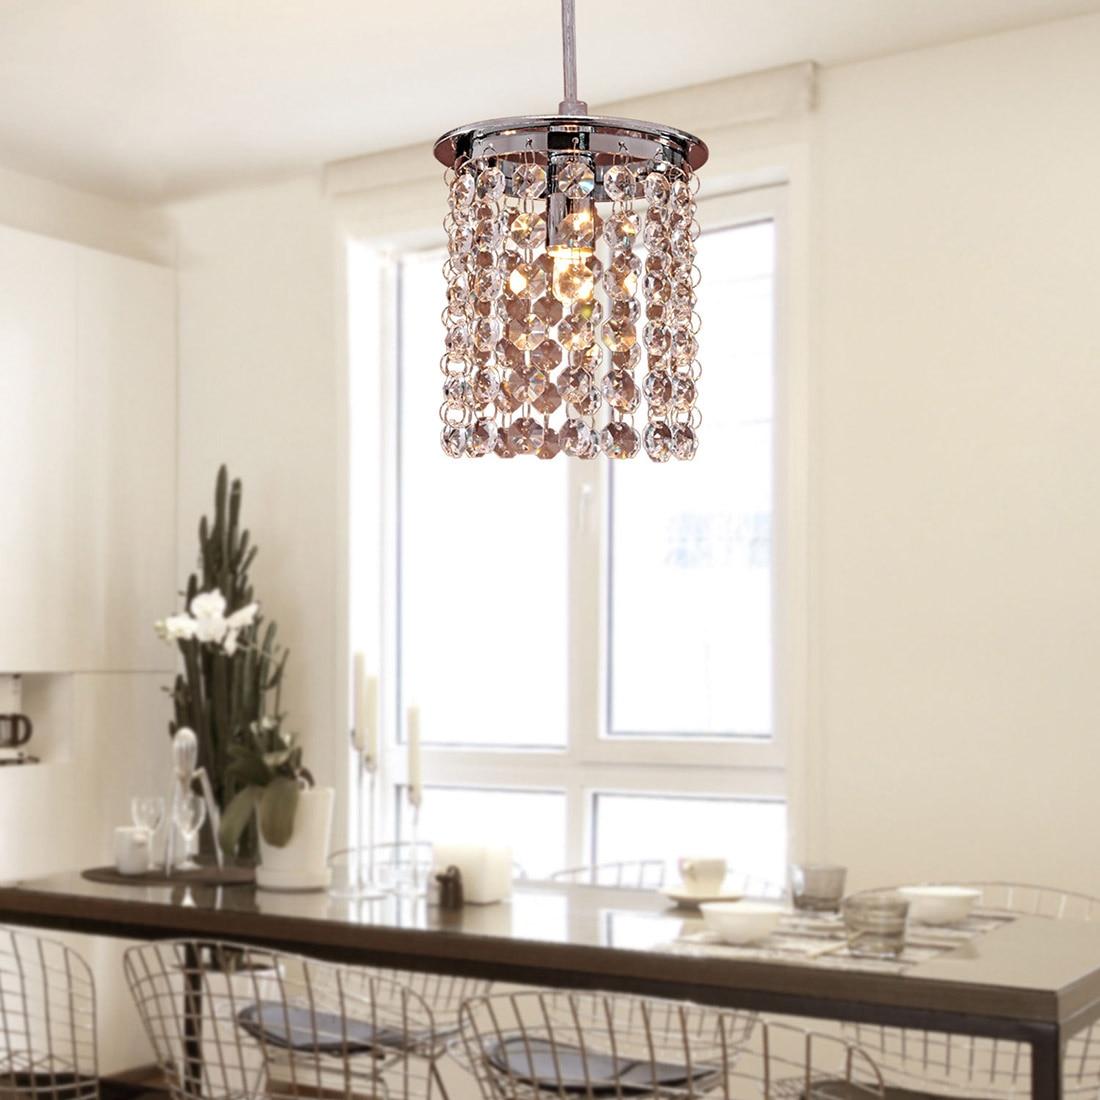 NFLC-Crystal Modern Chandelier Pendant Kitchen Dining Room Fixture Ligh<br><br>Aliexpress